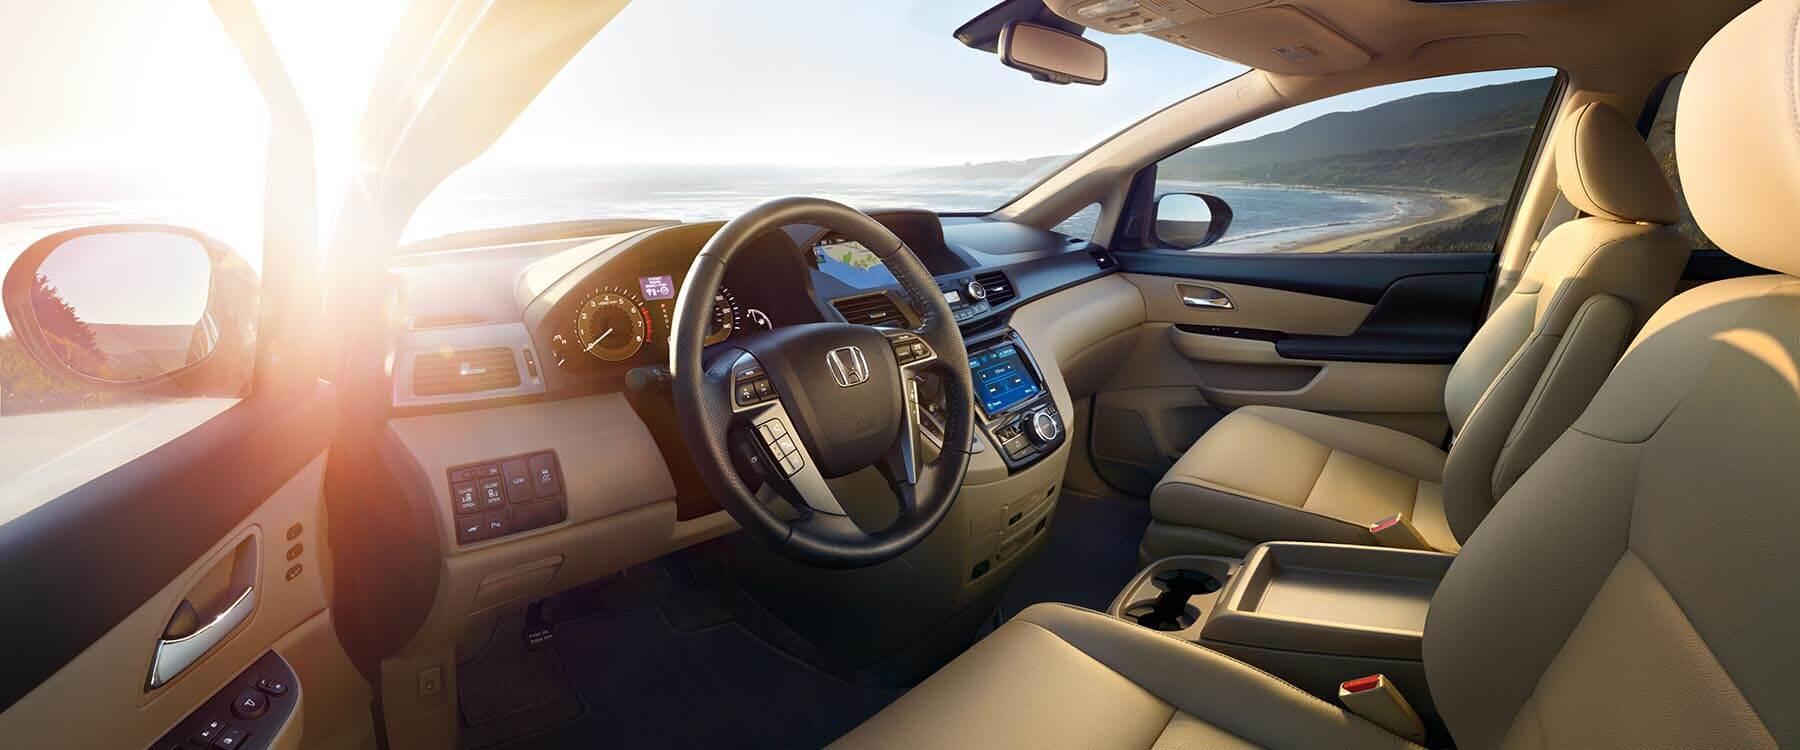 2017 Honda Odyssey Front Interior